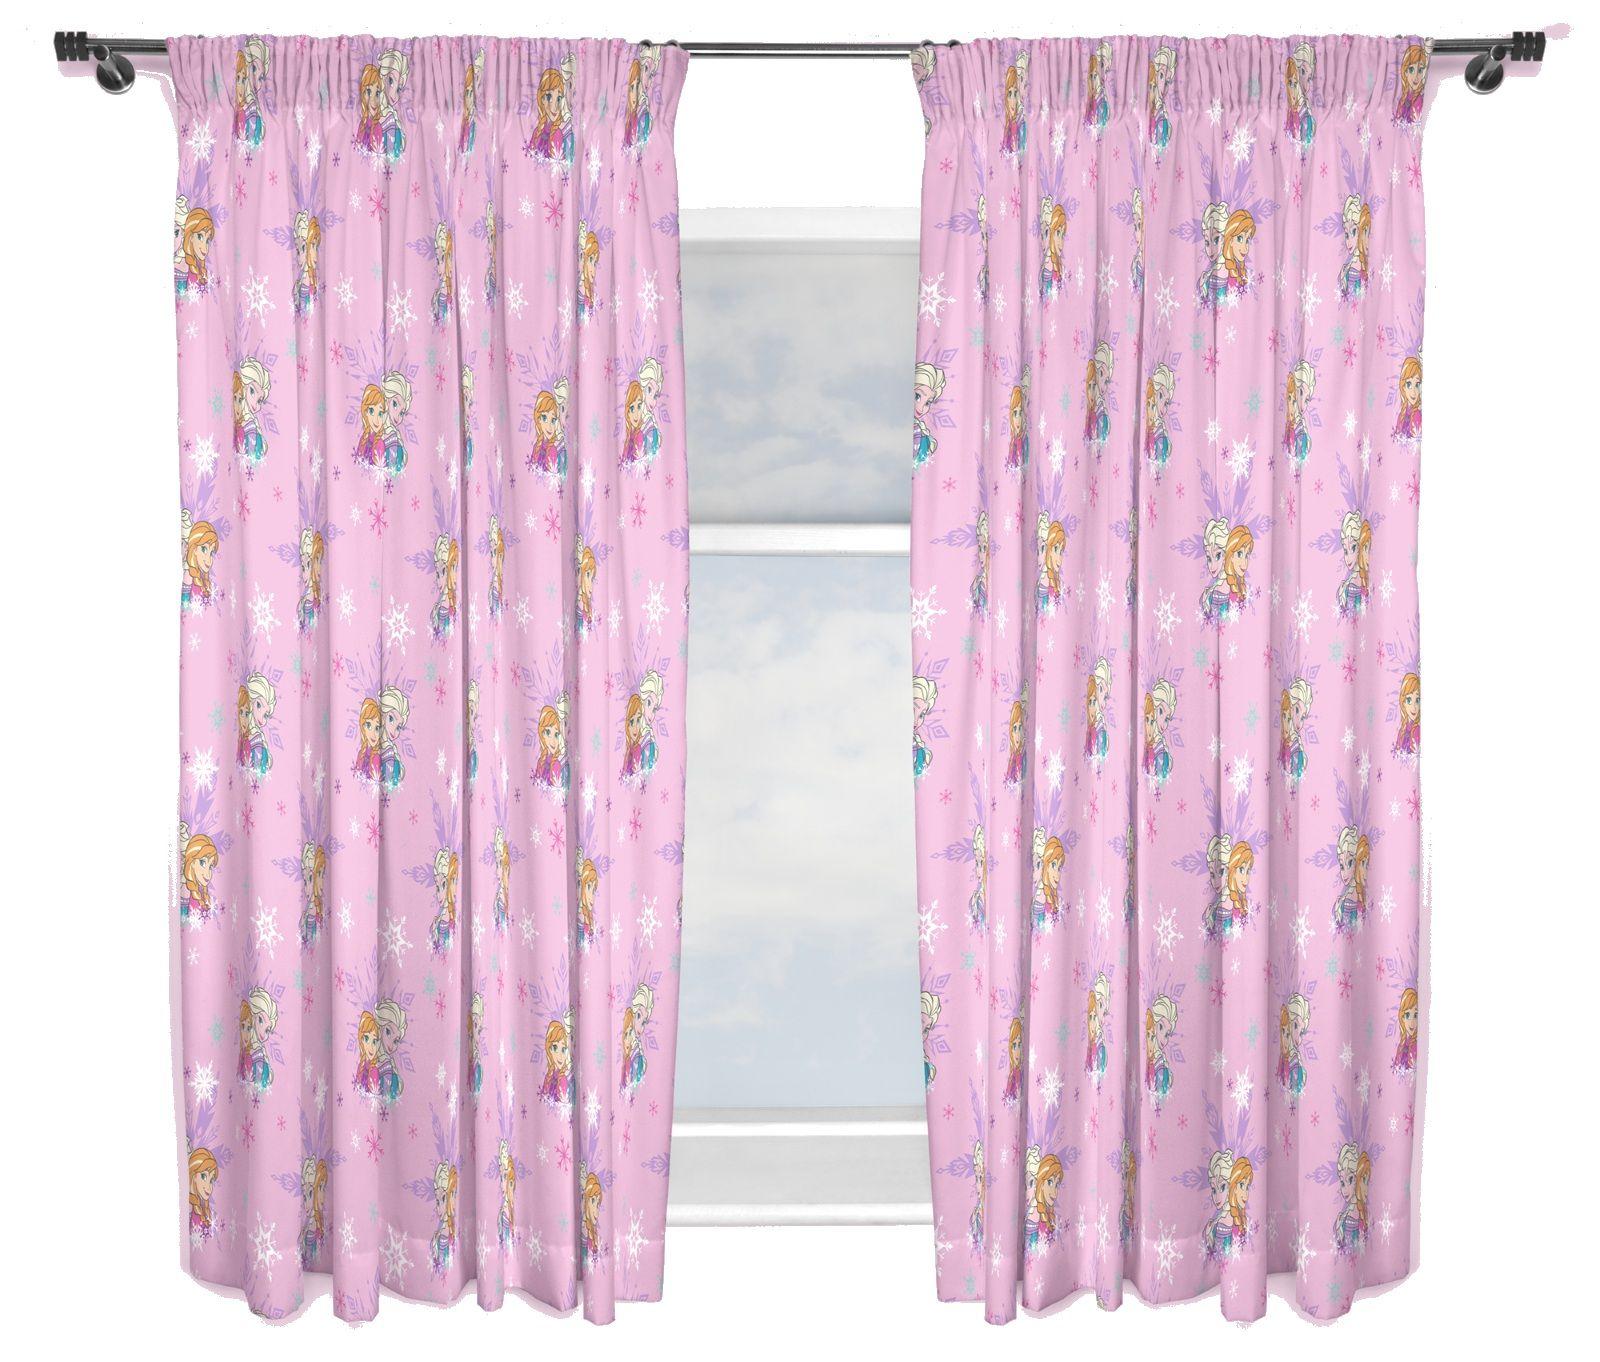 Jls Bedroom Curtains